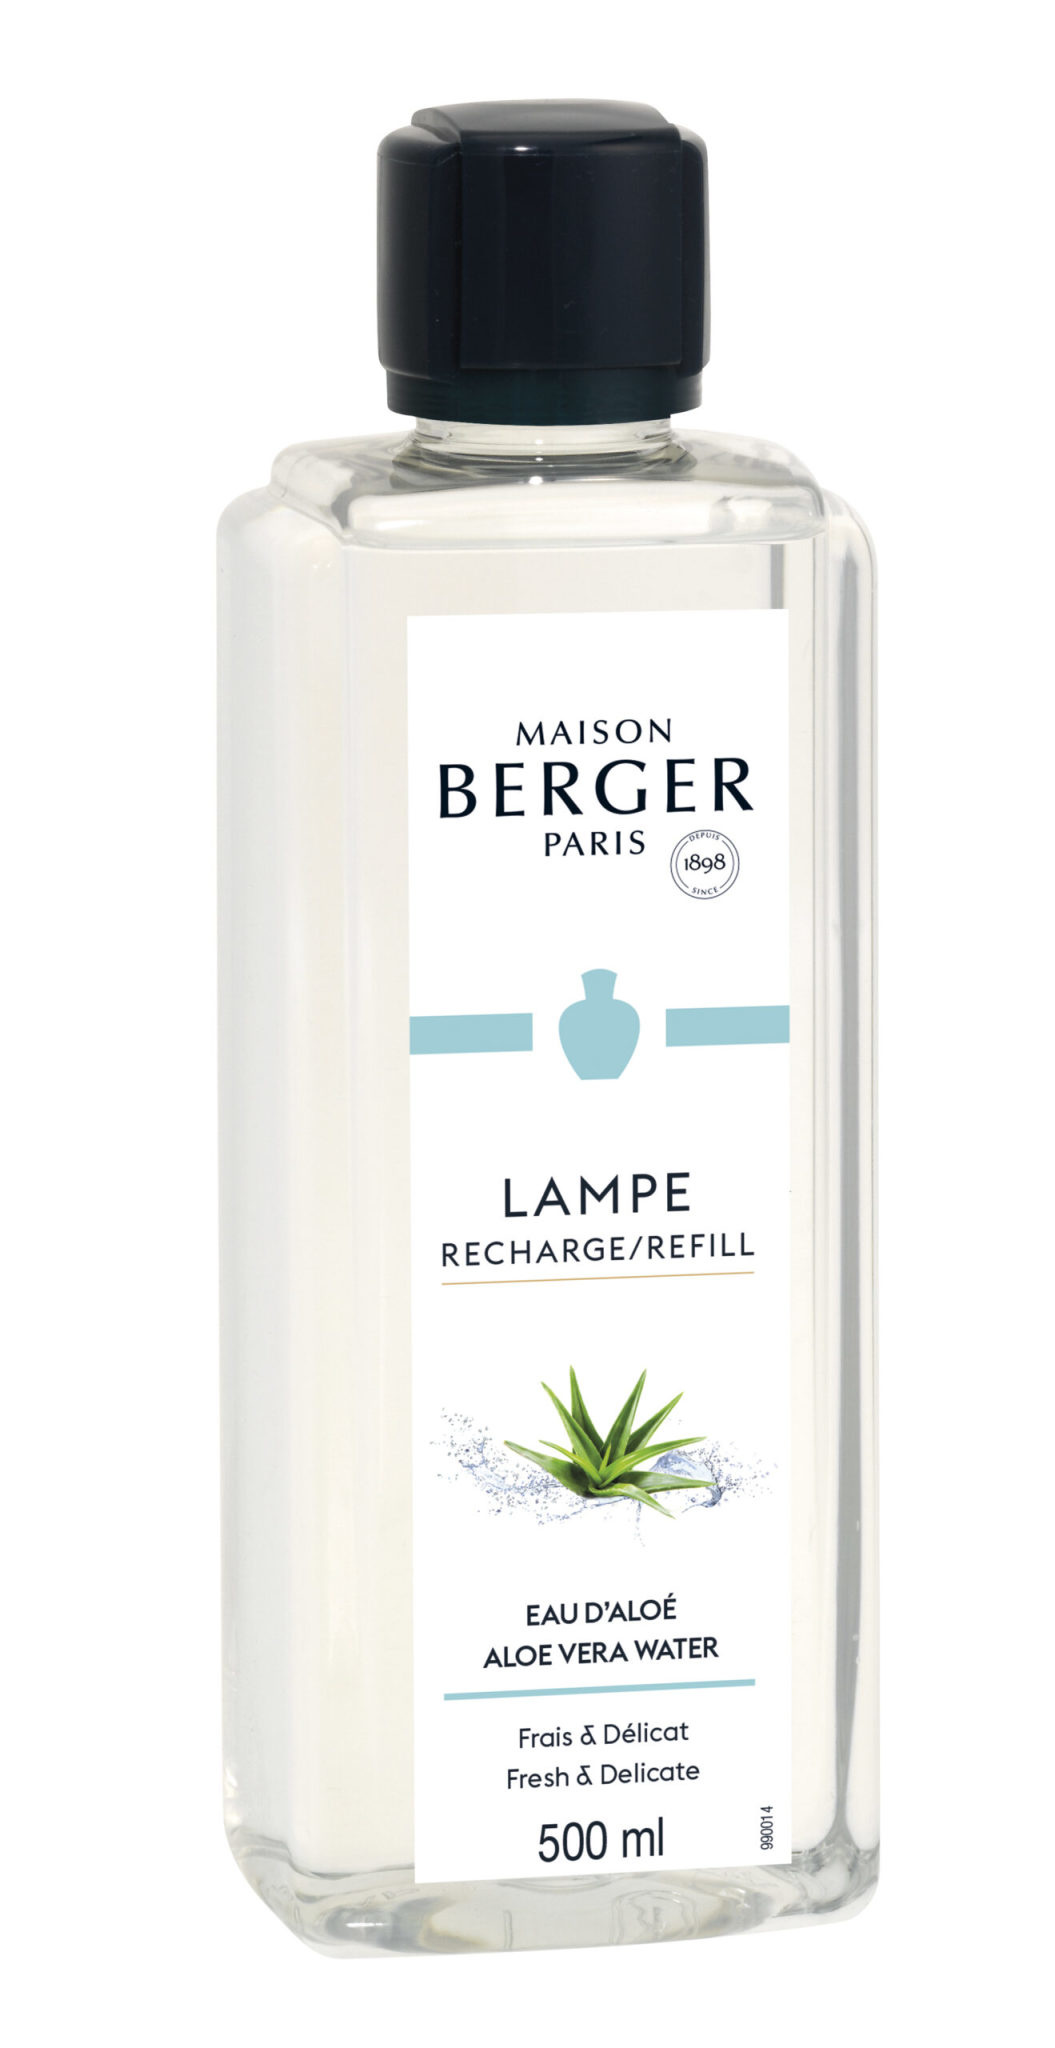 Lampe Berger Huisparfum Eau d' Vera 500 ml